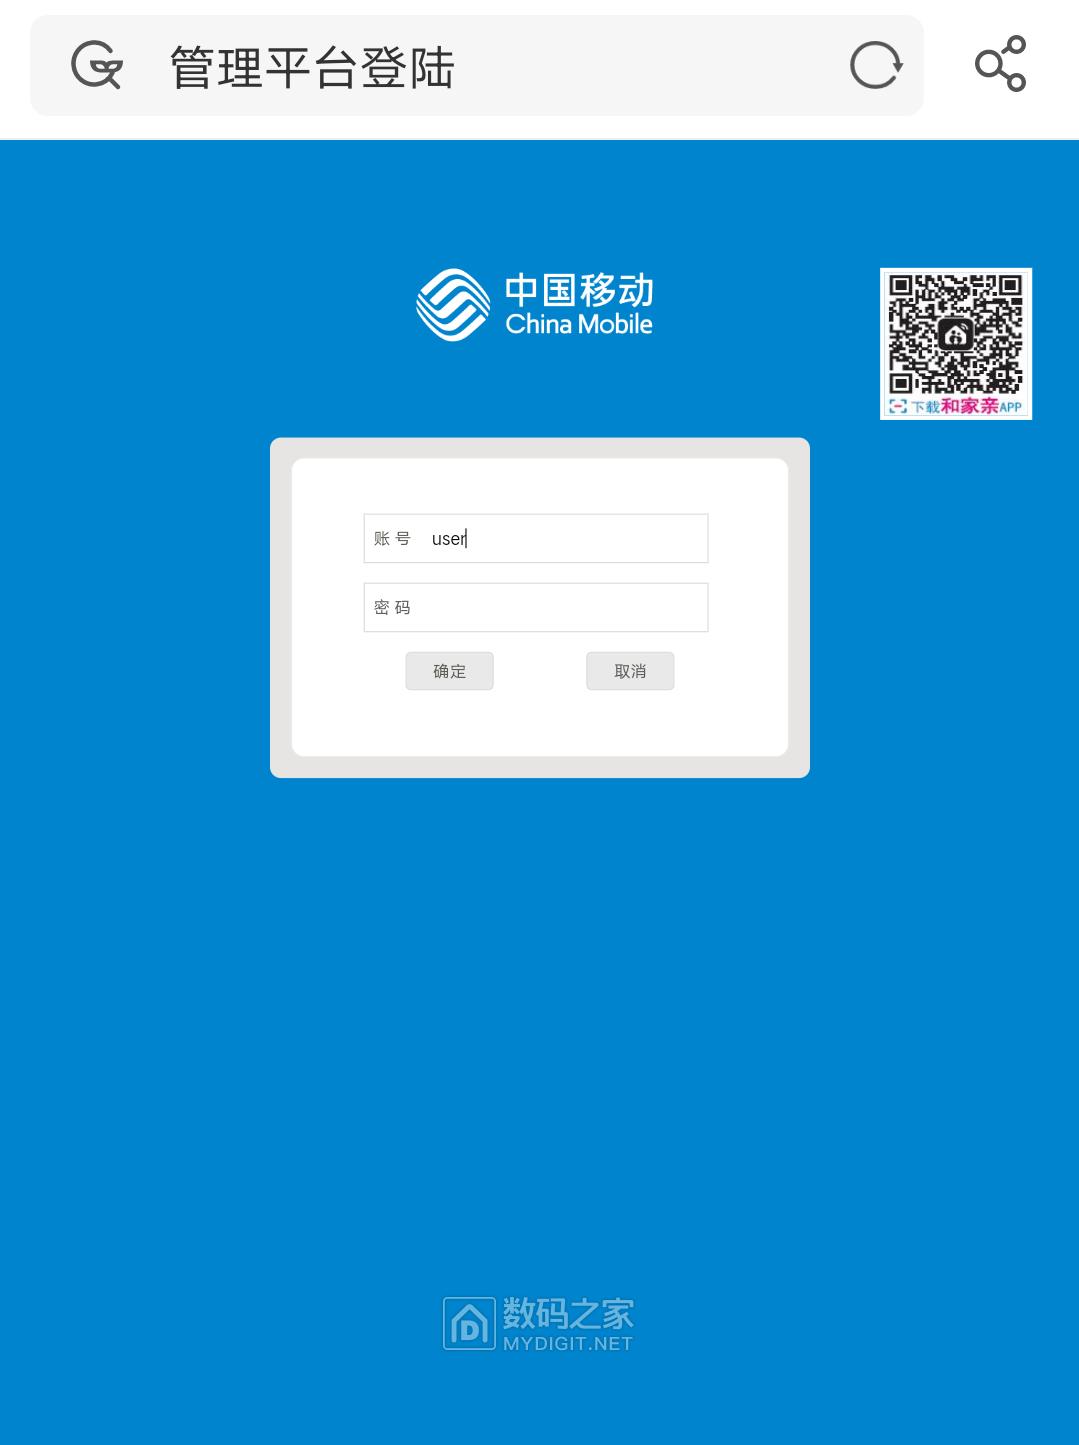 Screenshot_2021_0623_185337.png